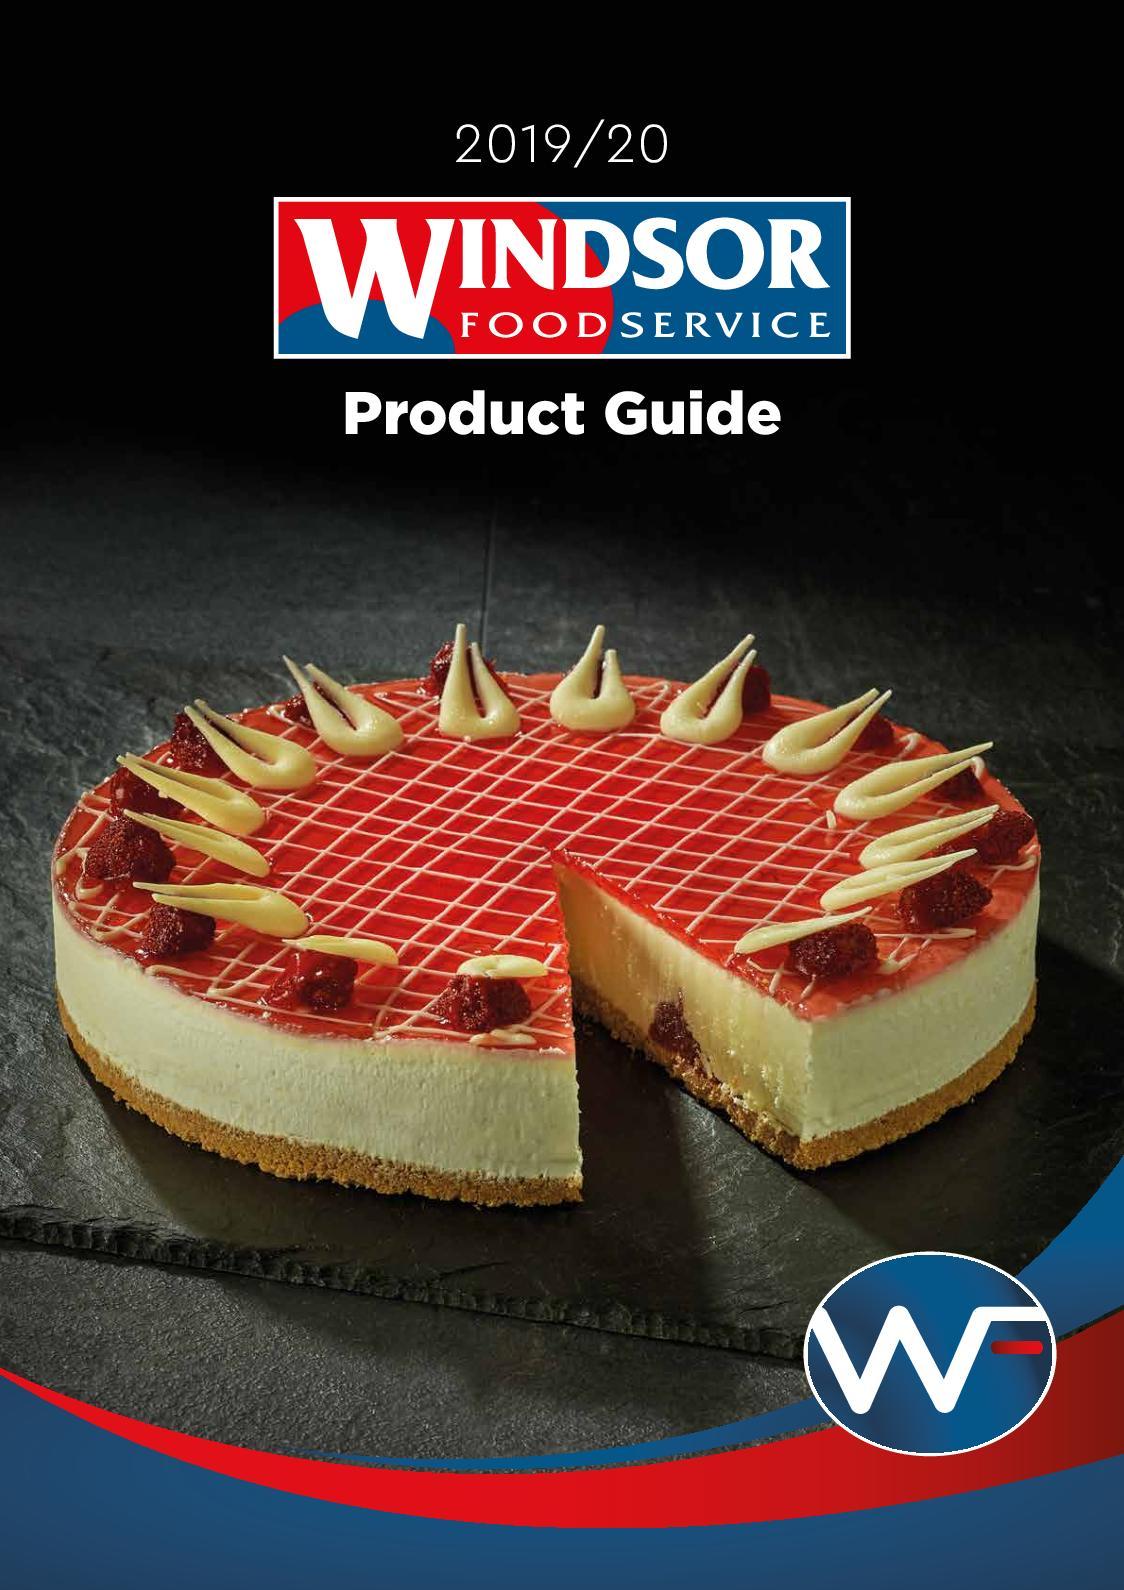 Calaméo - Windsor Product Guide 2019/20